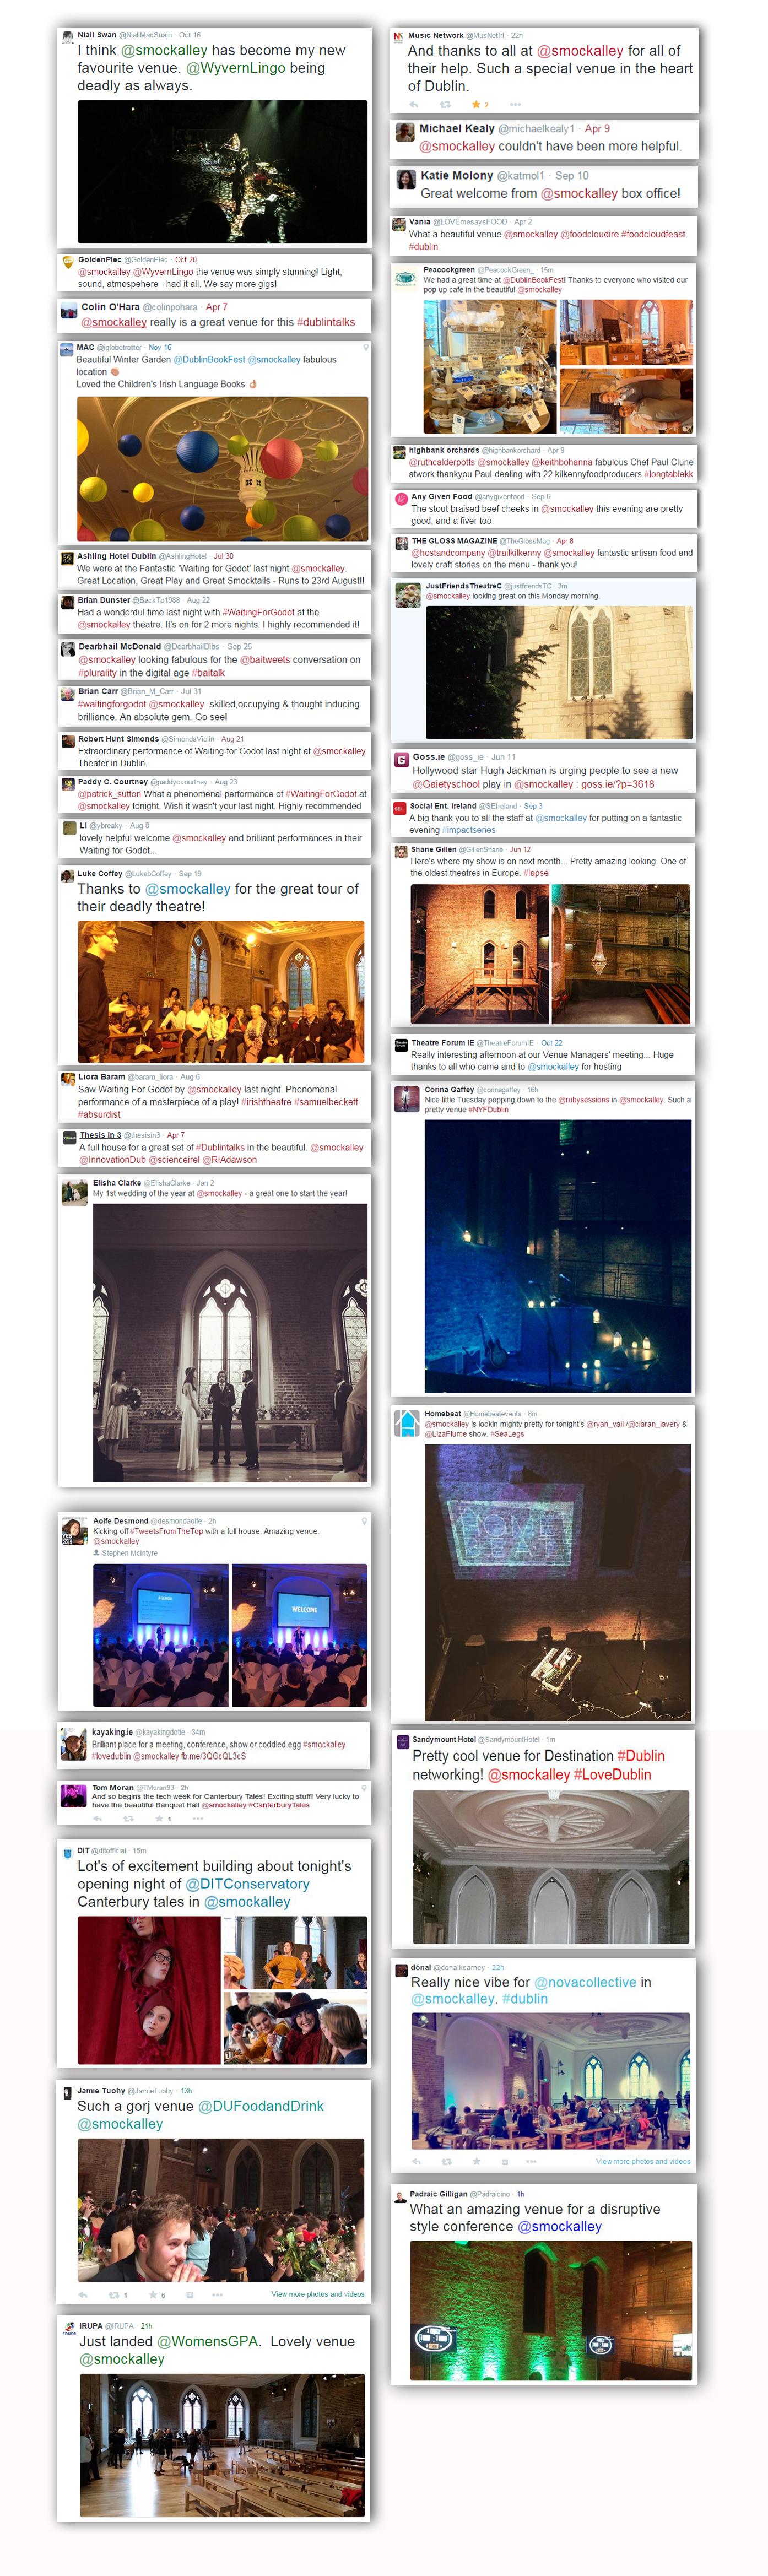 Social Media May 2015 copy